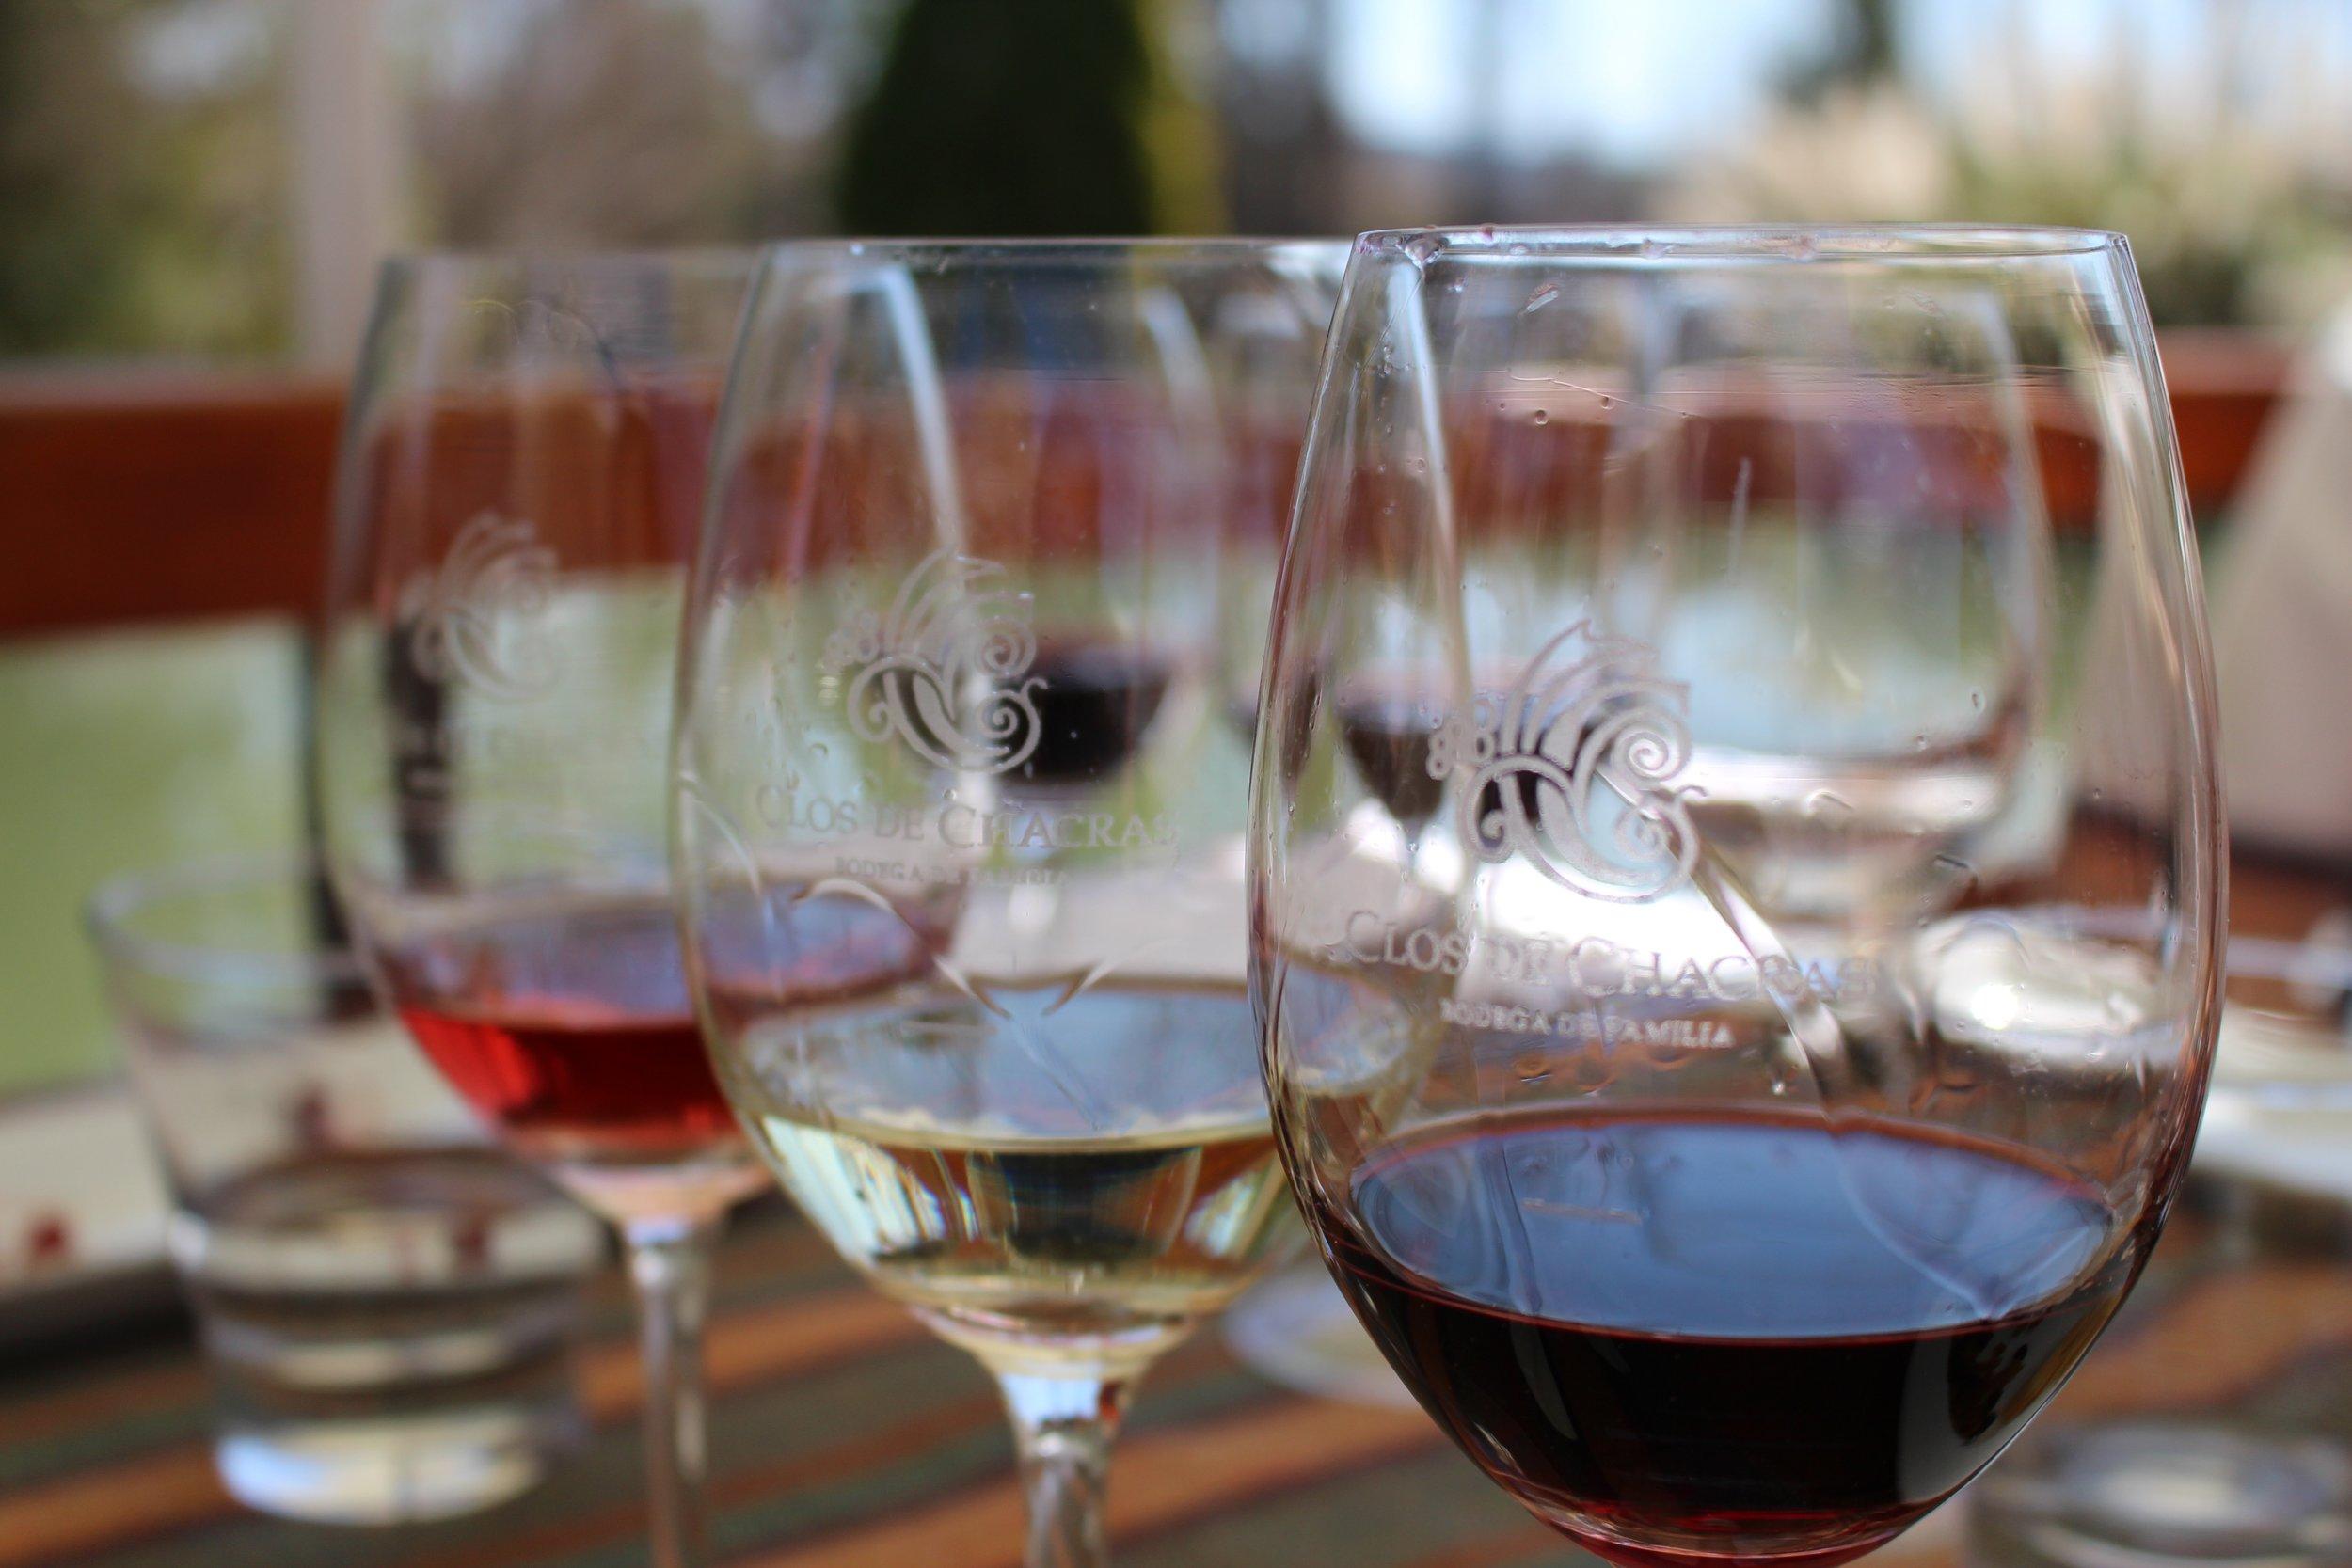 Rose, White and Red at Clos de Chacras Vineyard, Mendoza